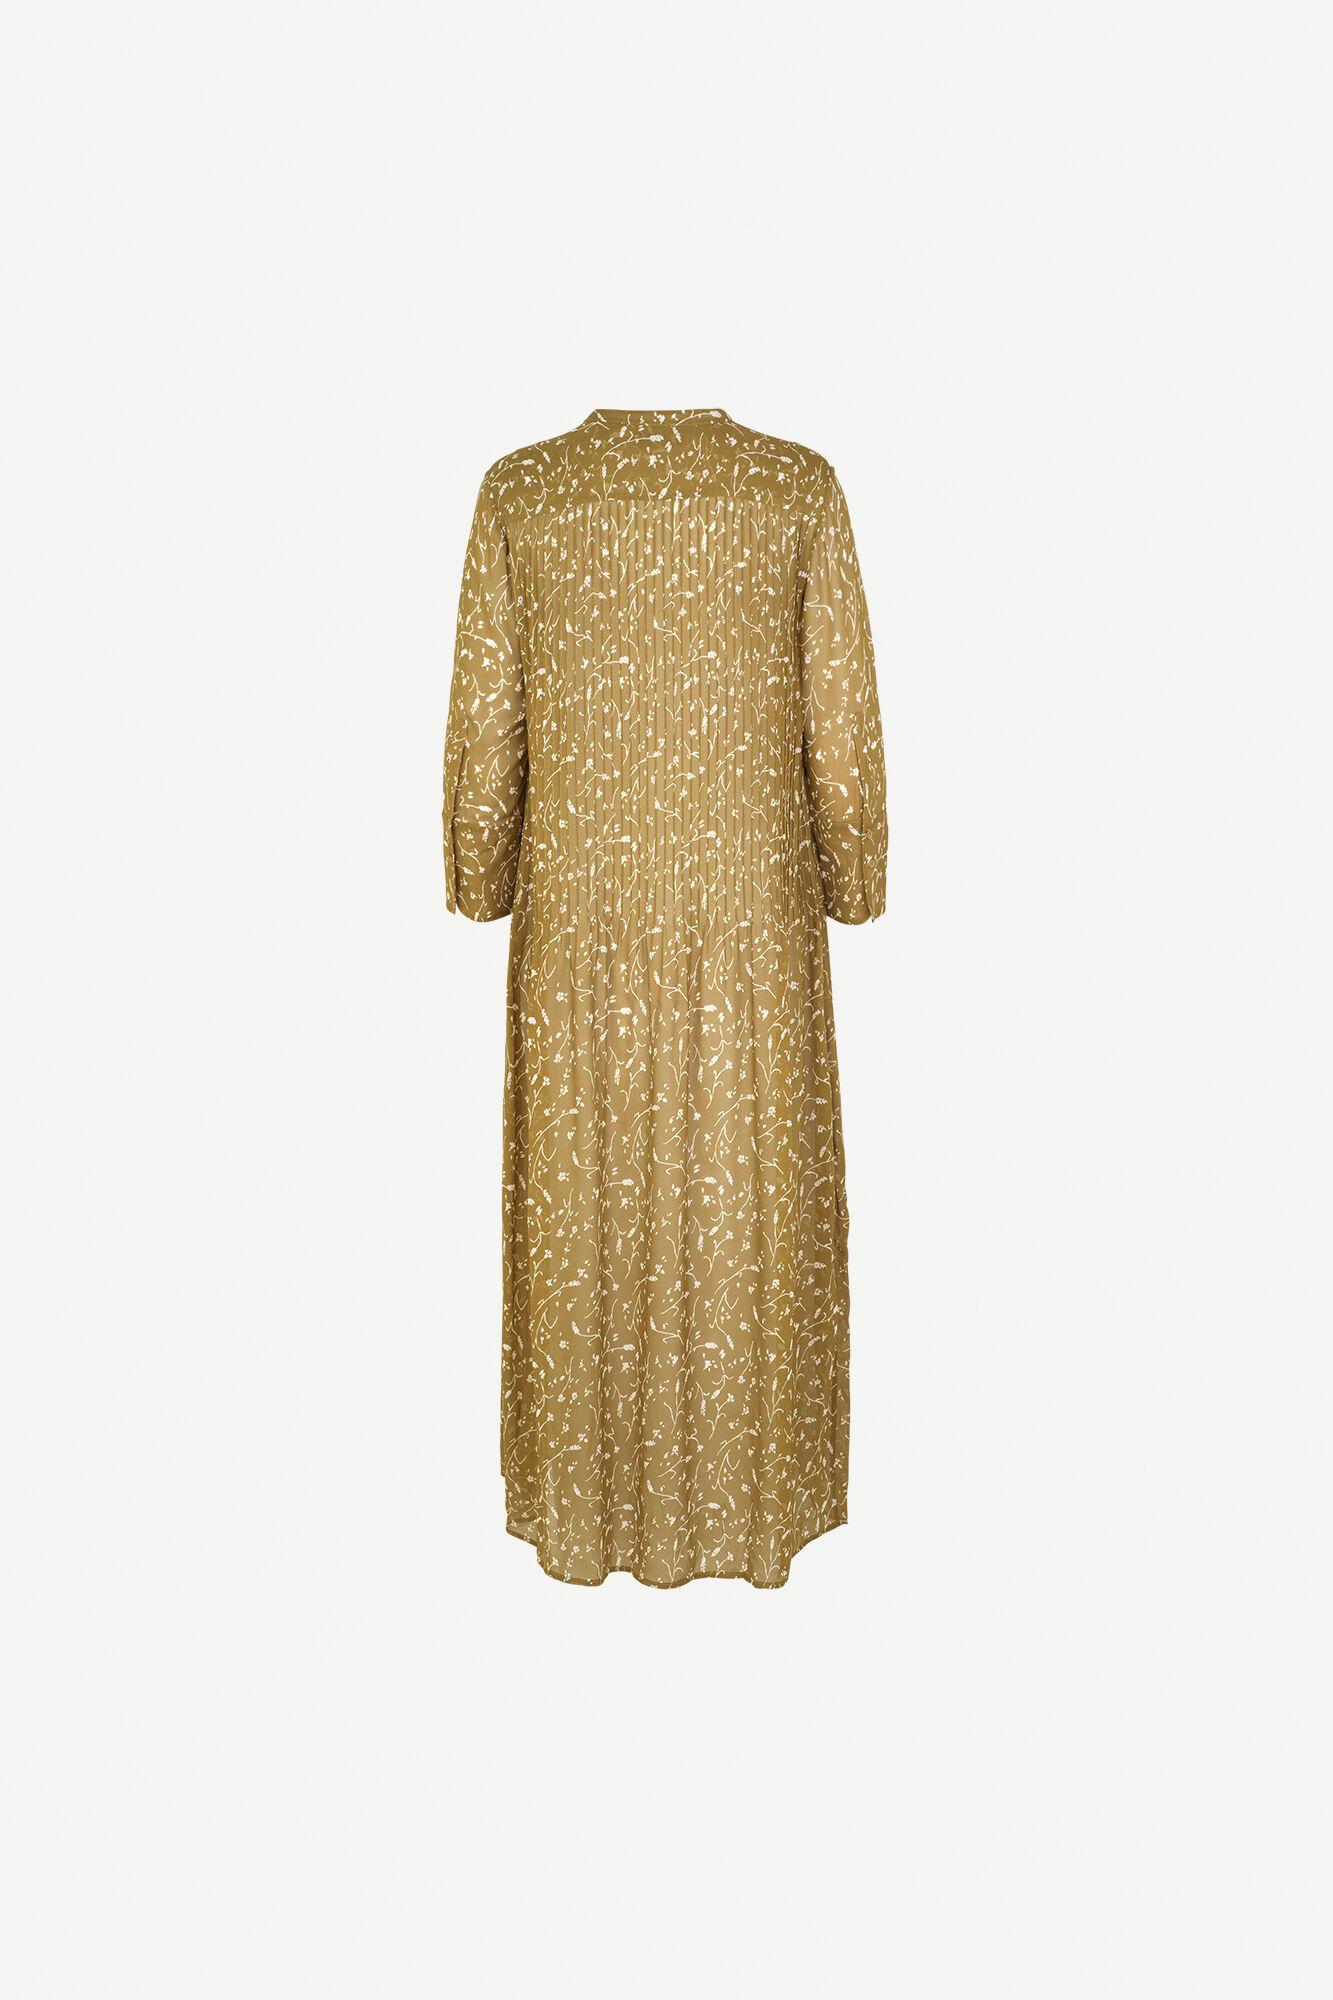 Elm ml dress aop 9695, FEUILLES KHAKI